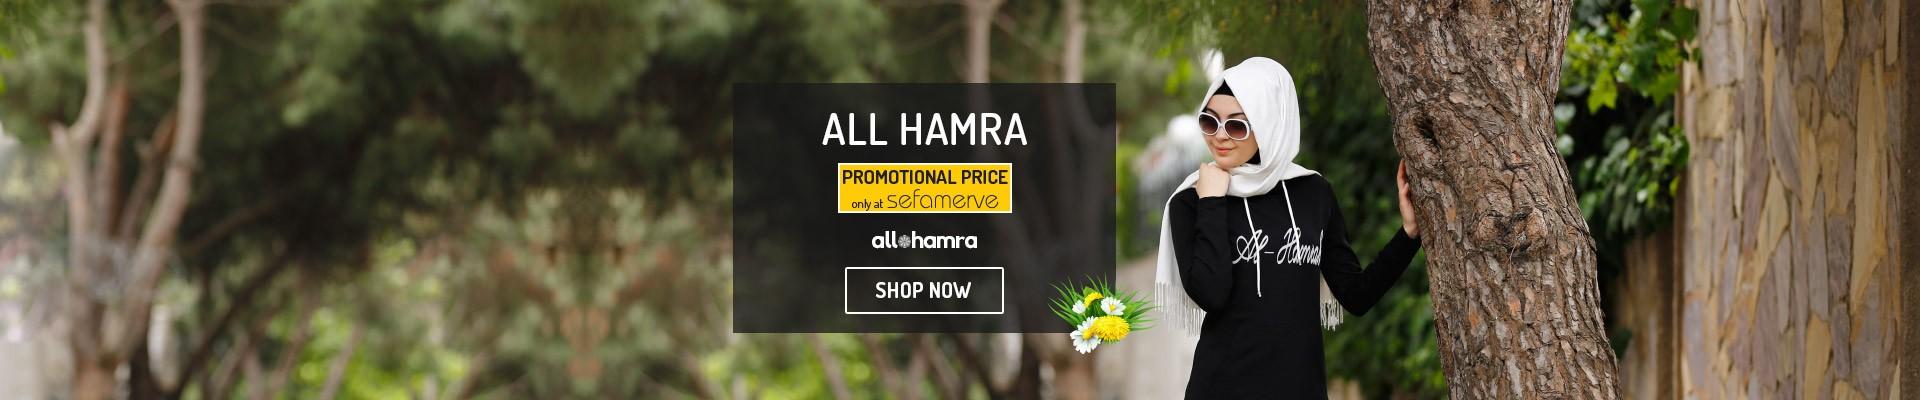 All Hamra